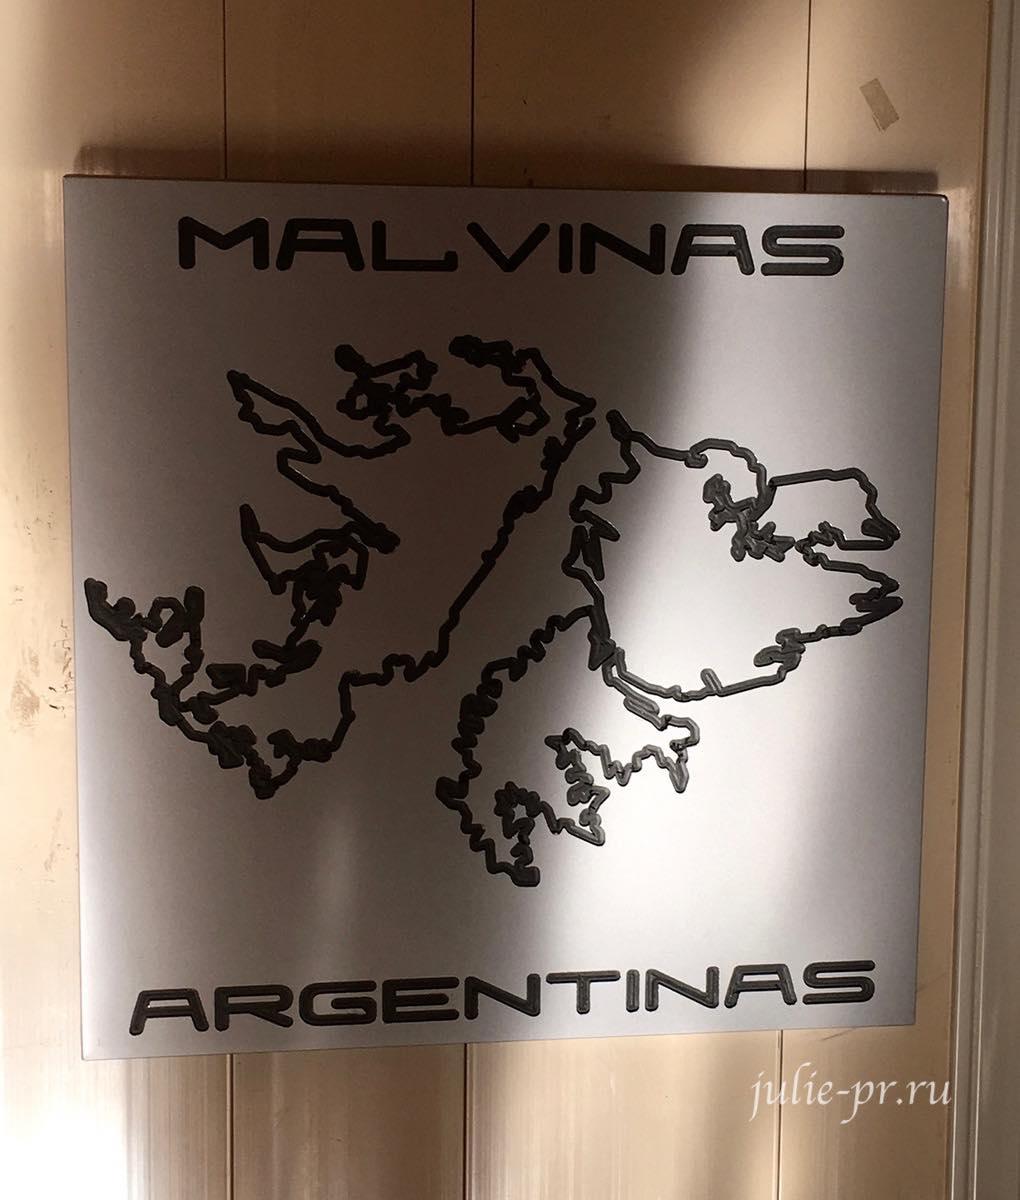 Аргентина, Патагония, граница, плакат с Мальвинскими островами